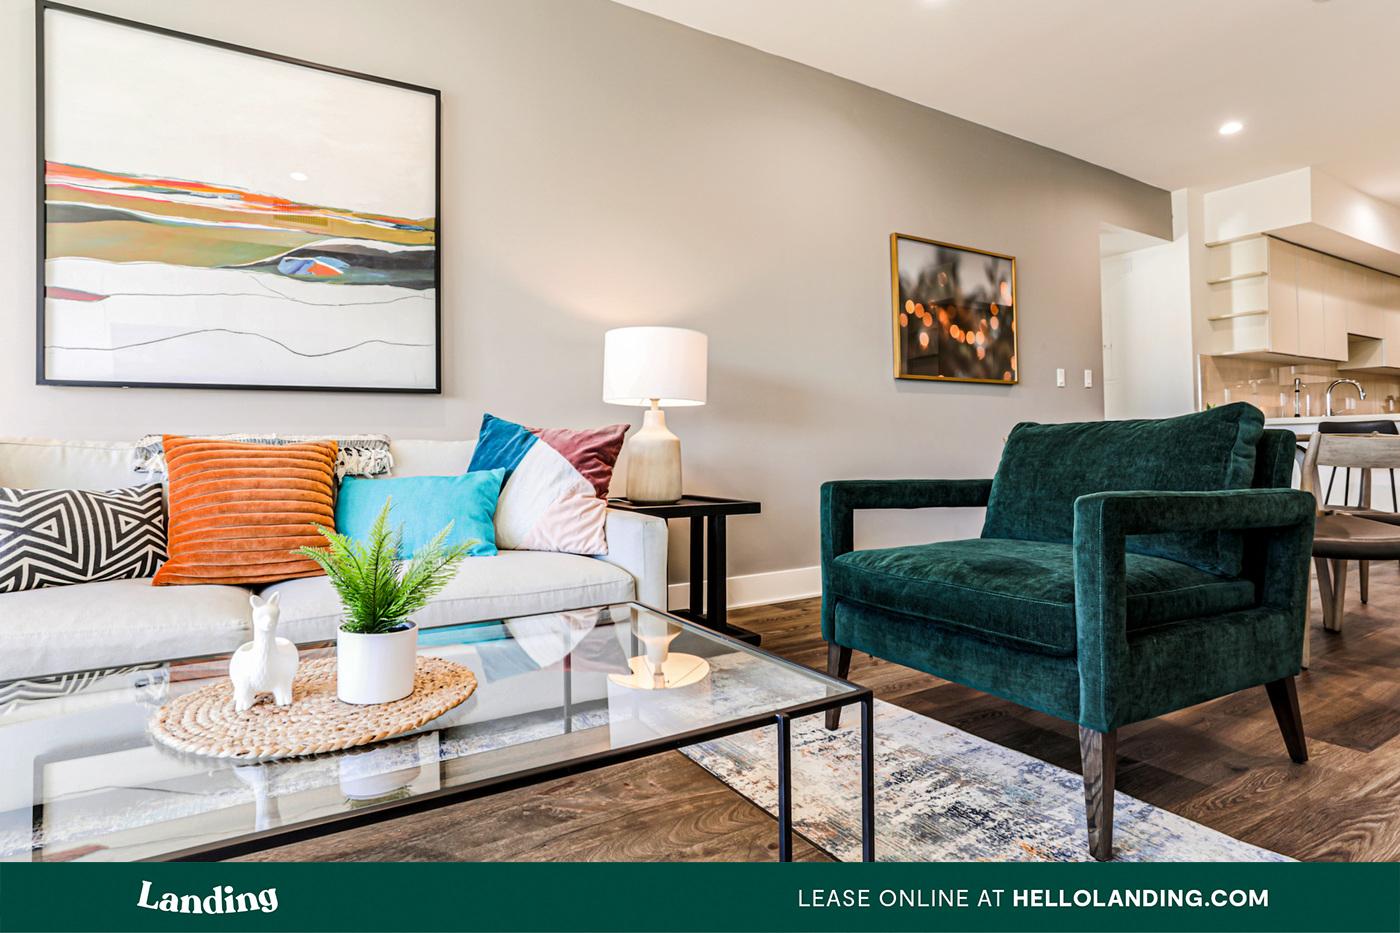 Landing Furnished Apartment Parker Hilltop Apartments